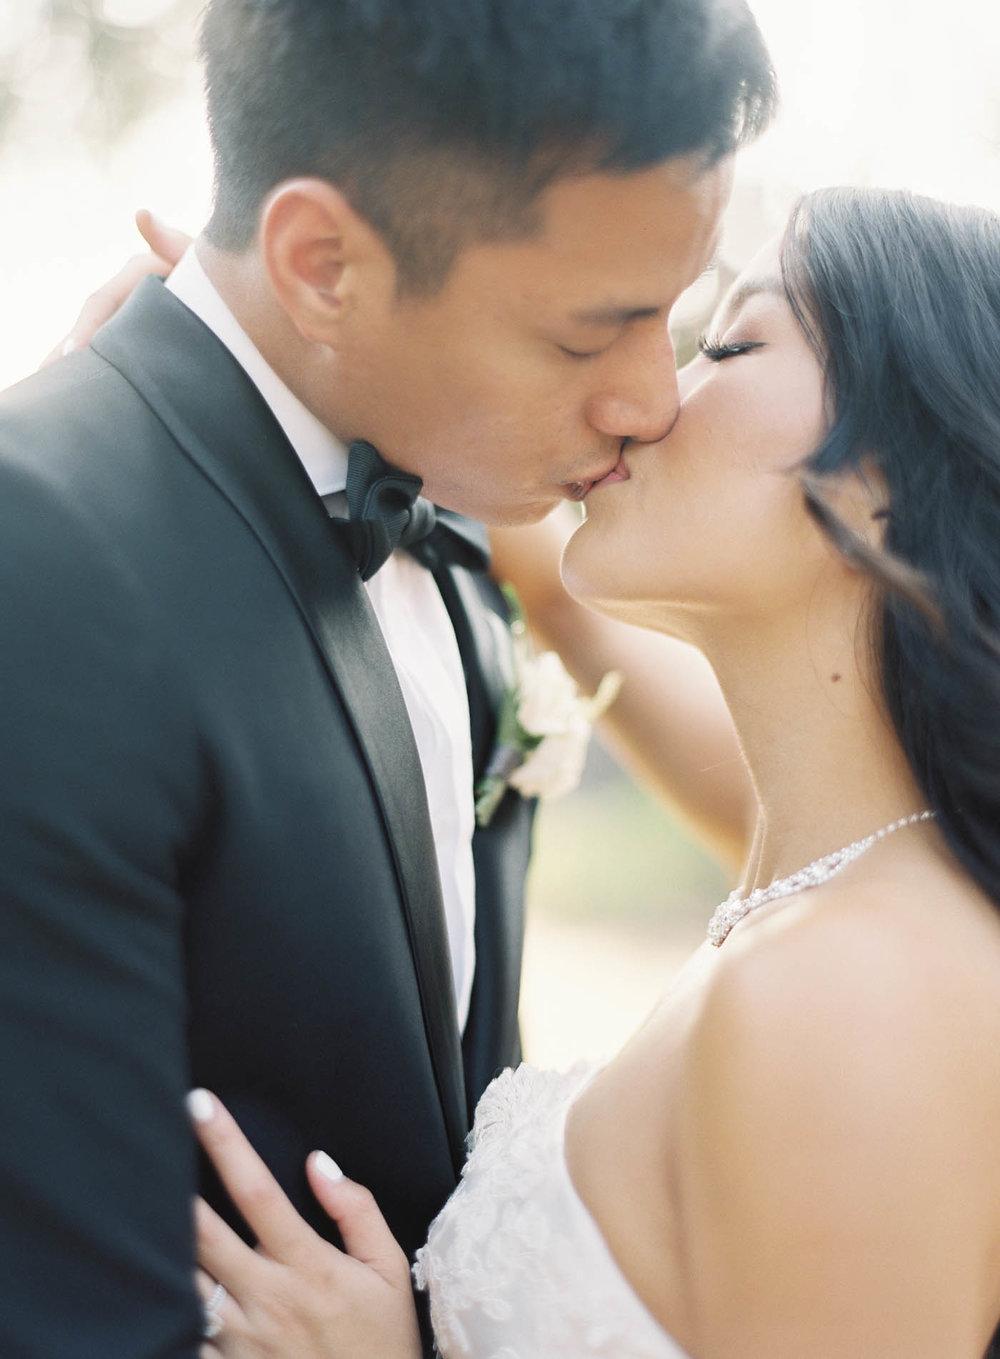 franciscan-gardens-wedding-14-Jen_Huang-000762-R1-008.jpg